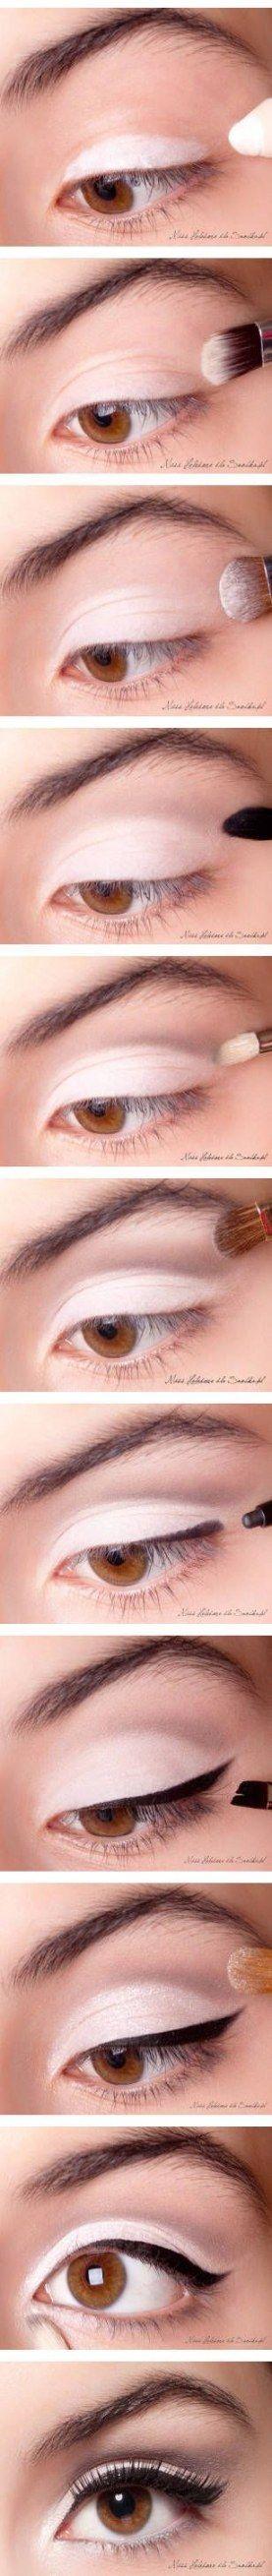 Makeup Wedding Night Winged Liner 37 Ideas #wingedliner